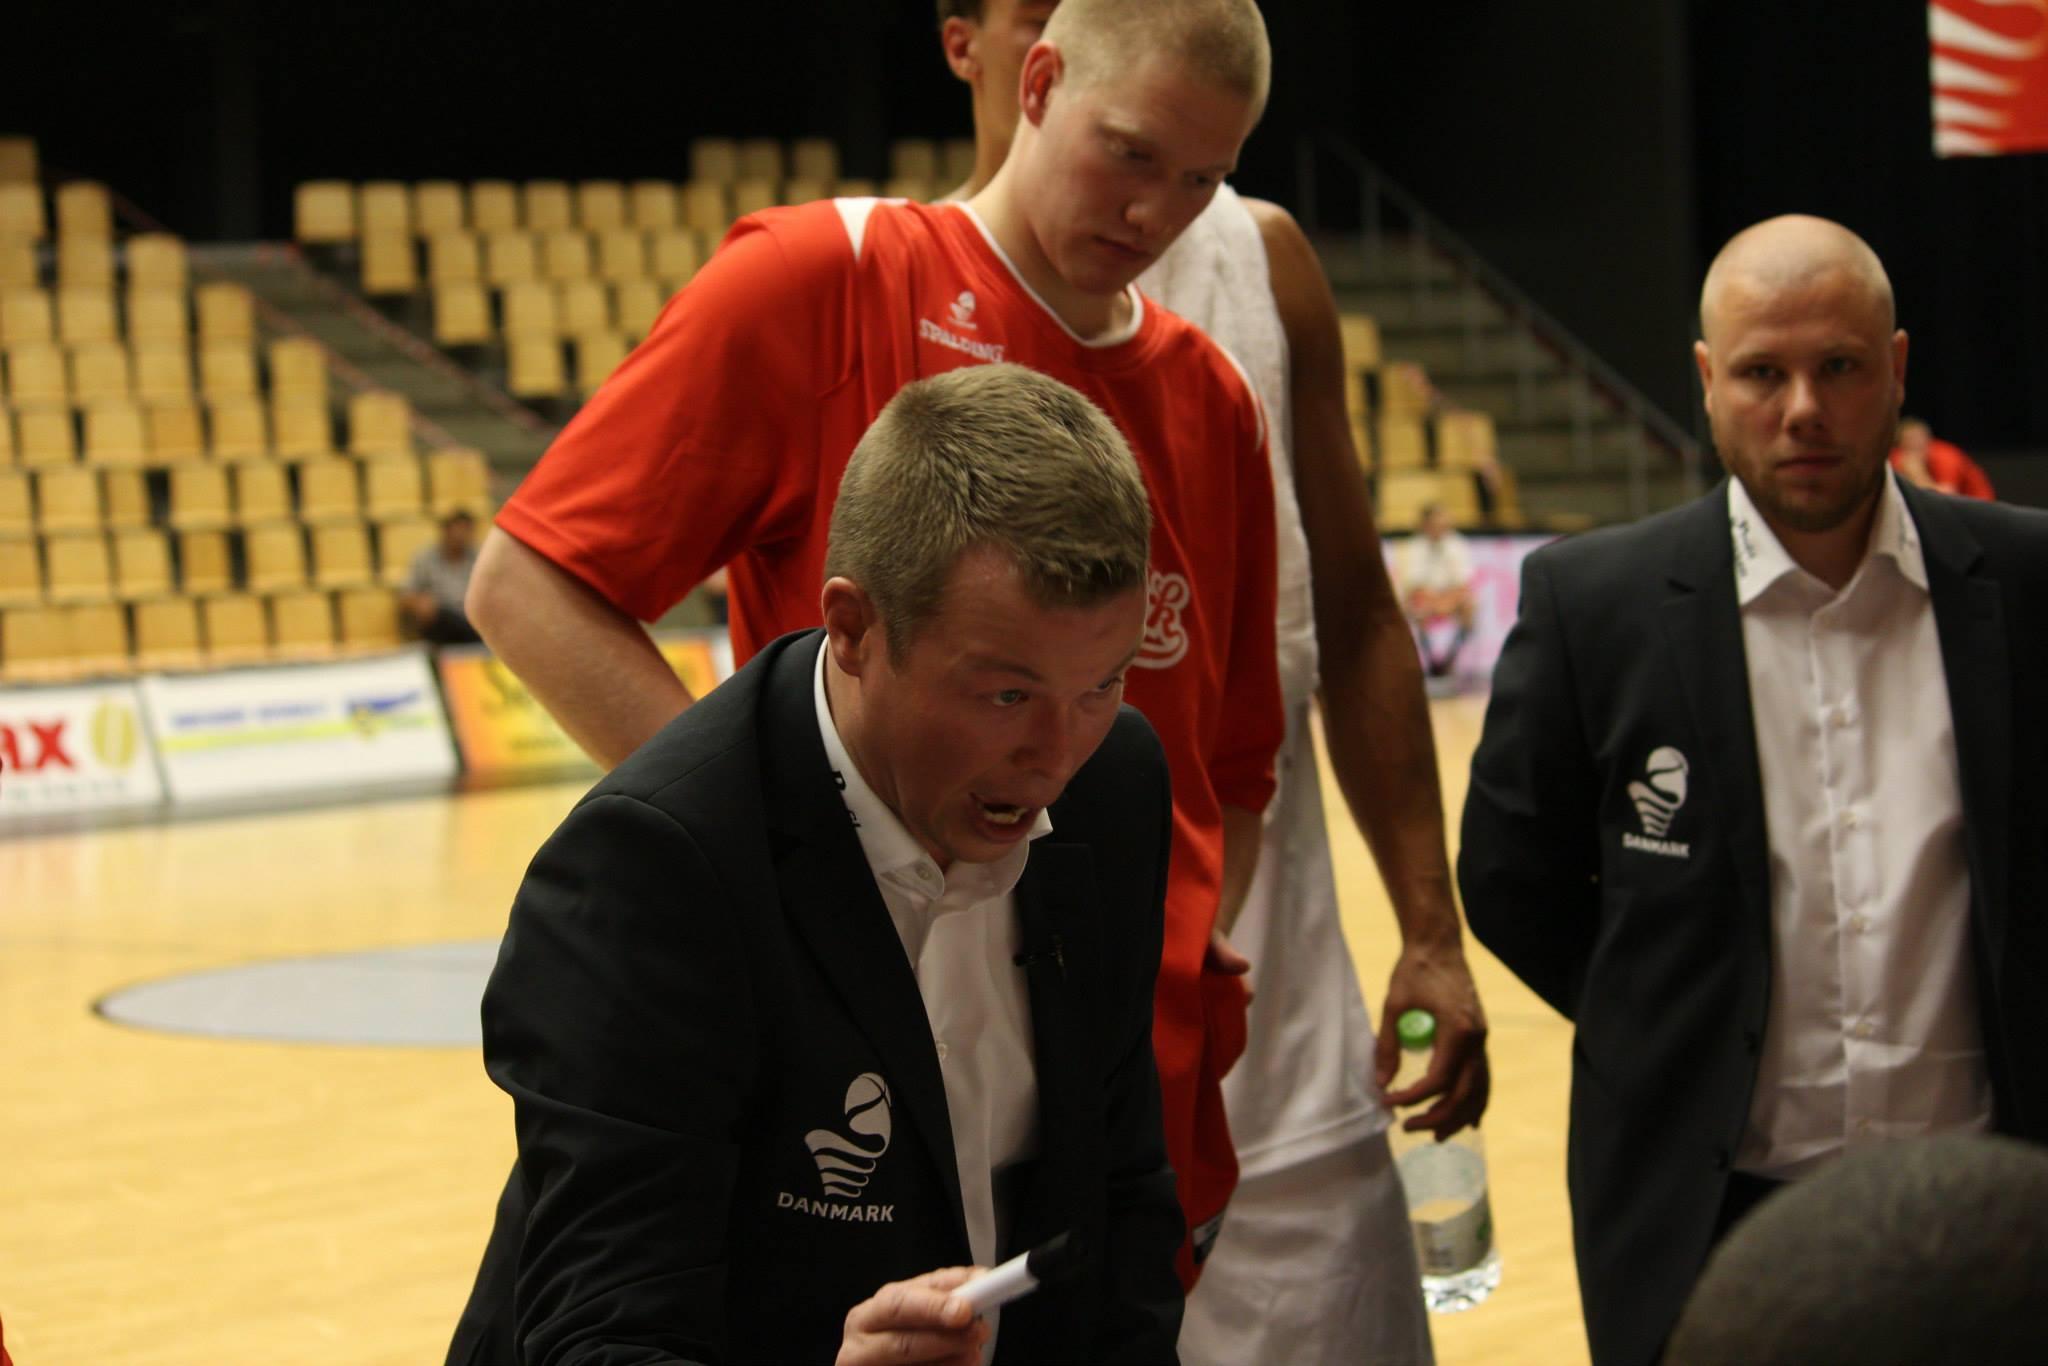 Pieti Poikola regner med flere erfarne spillere ved denne kvalifikationsrunde - Foto: Daniel Lambertsen